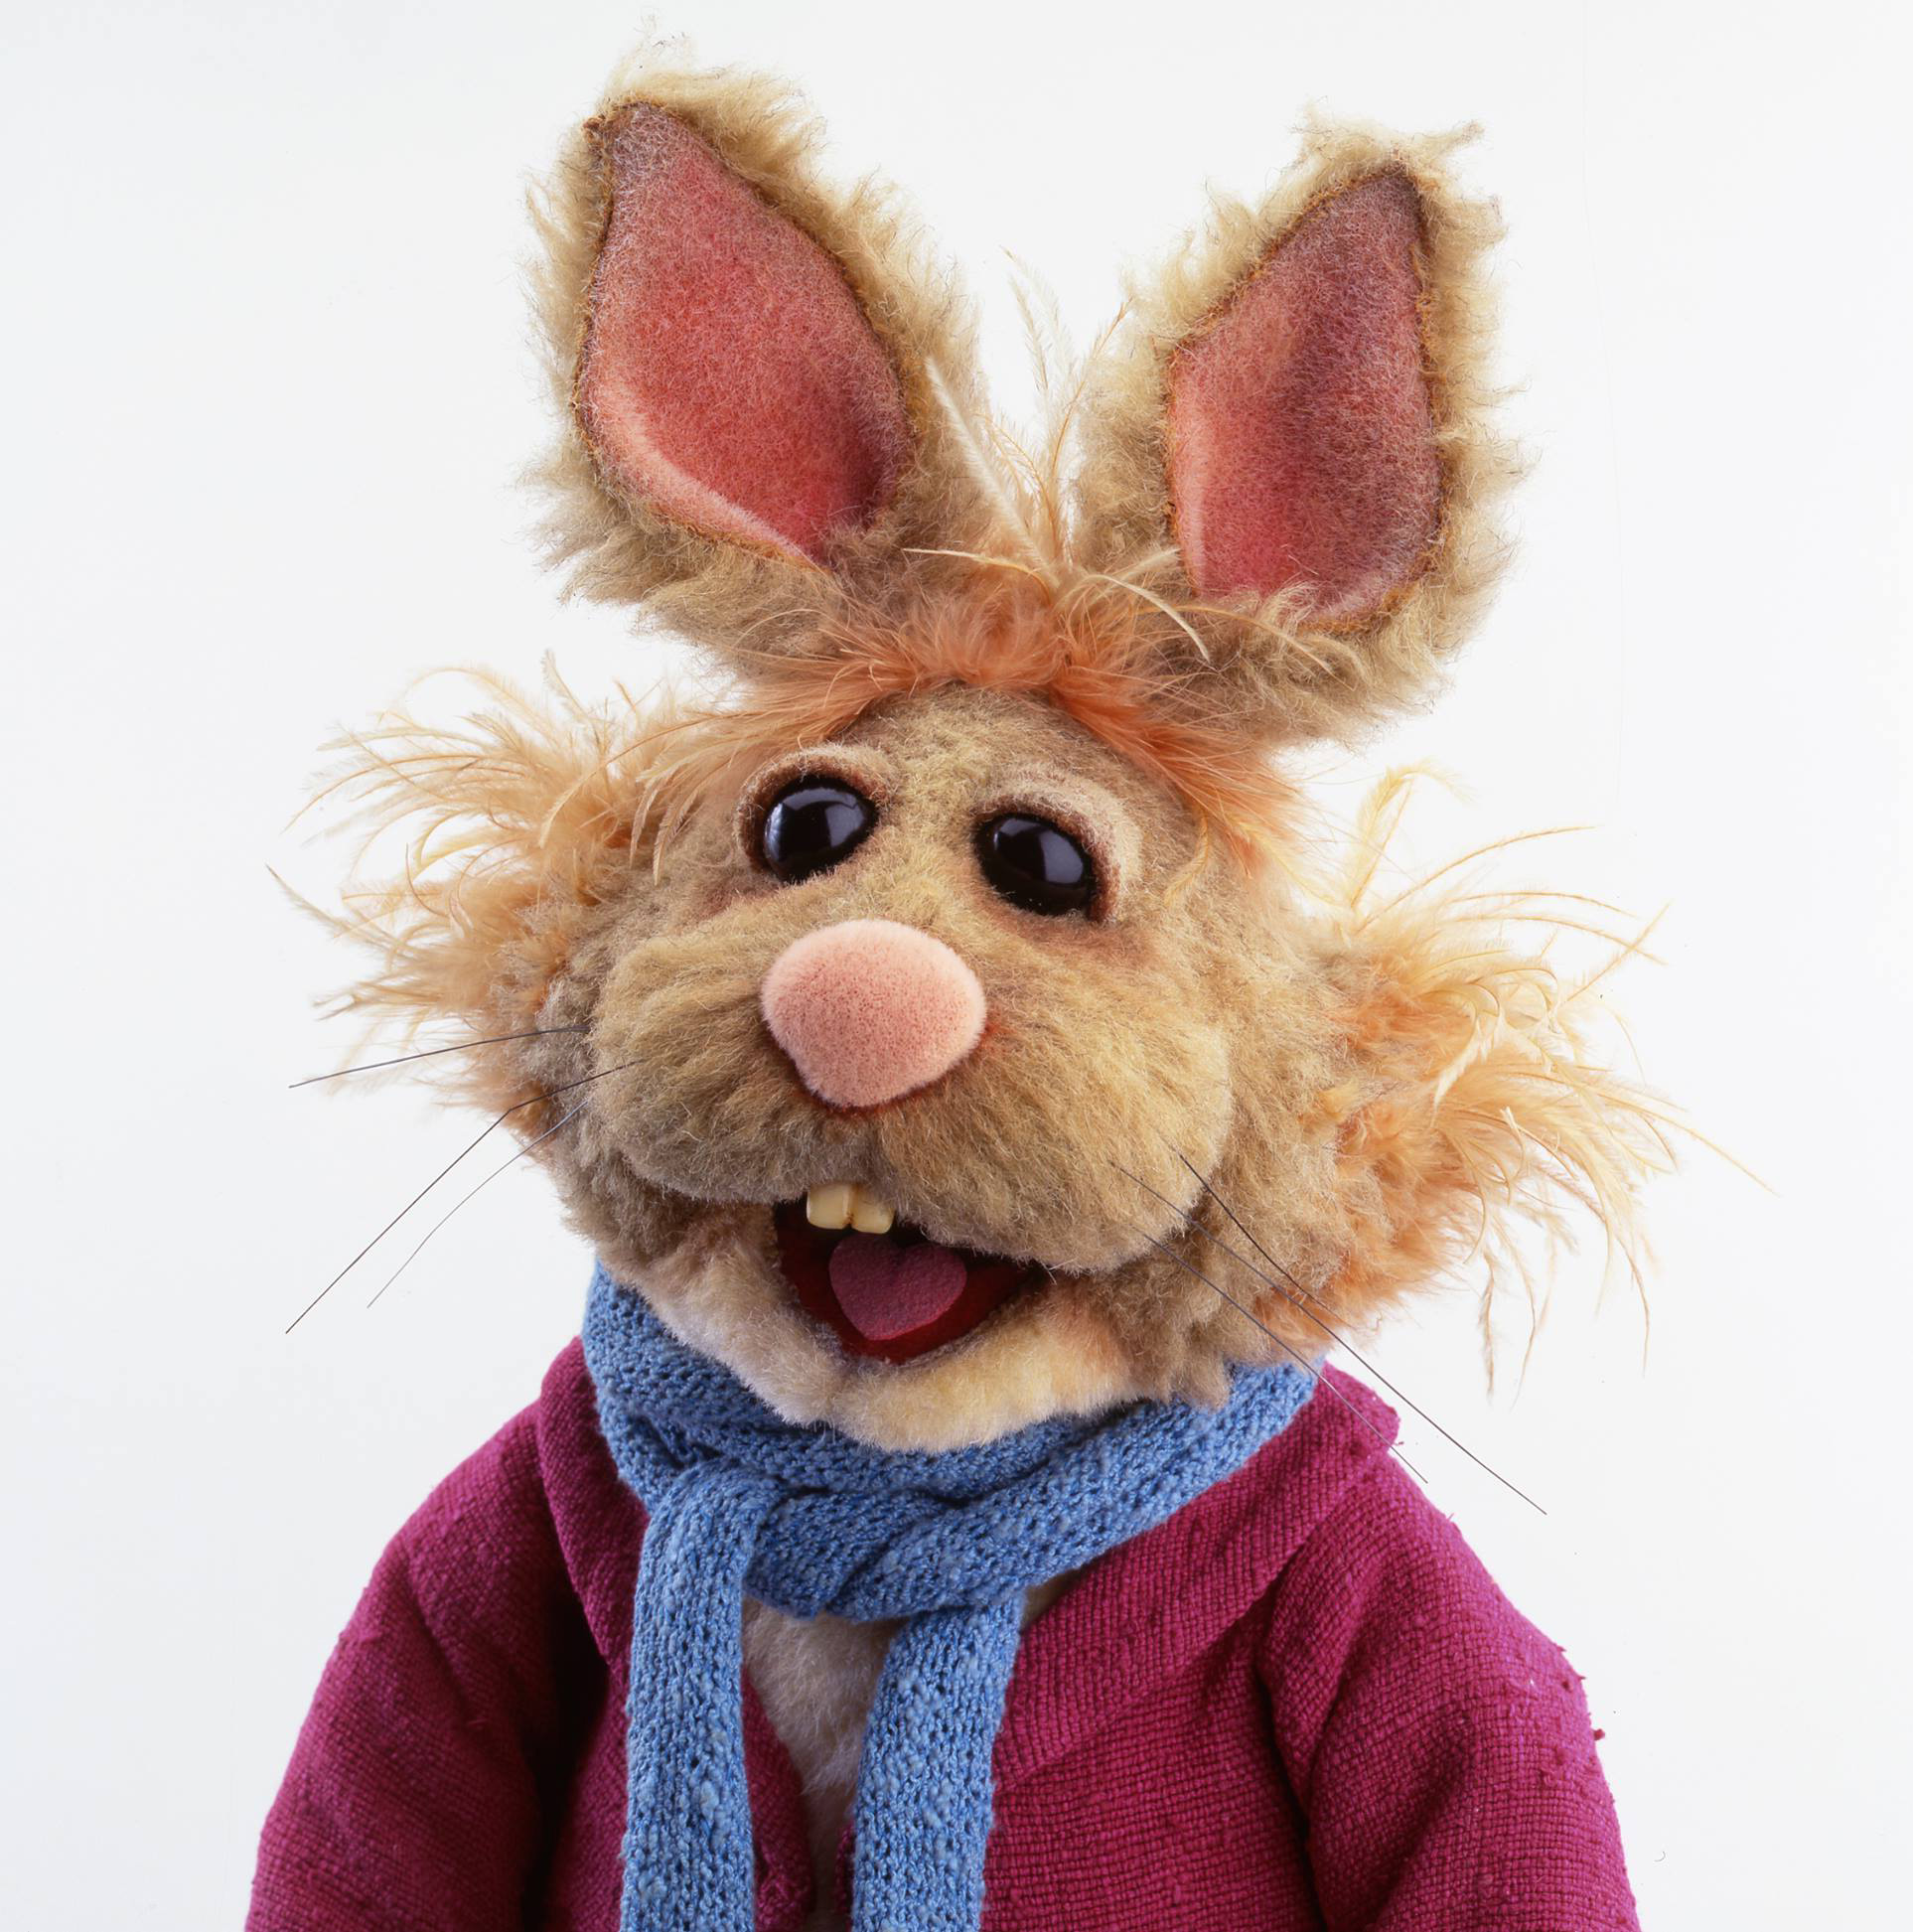 Bean Bunny Muppet Wiki Fandom Powered By Wikia